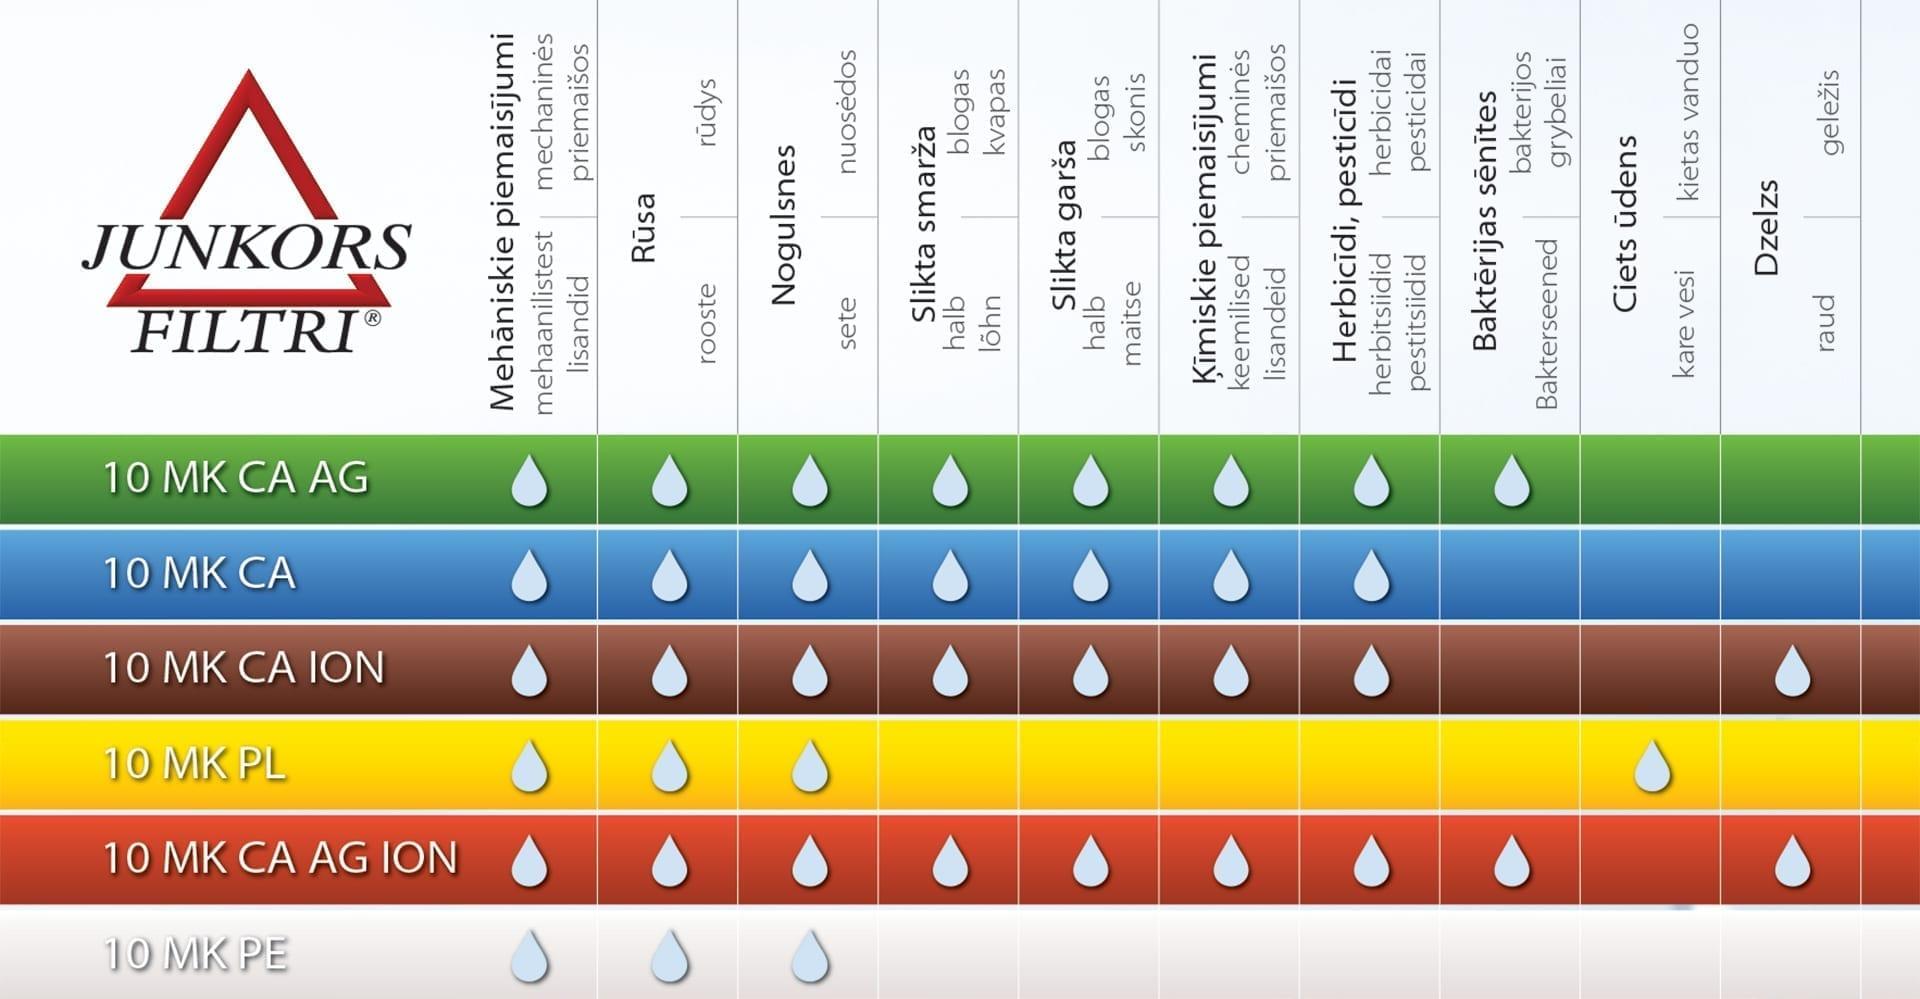 ūdens attīrīšanas filtri info tabula